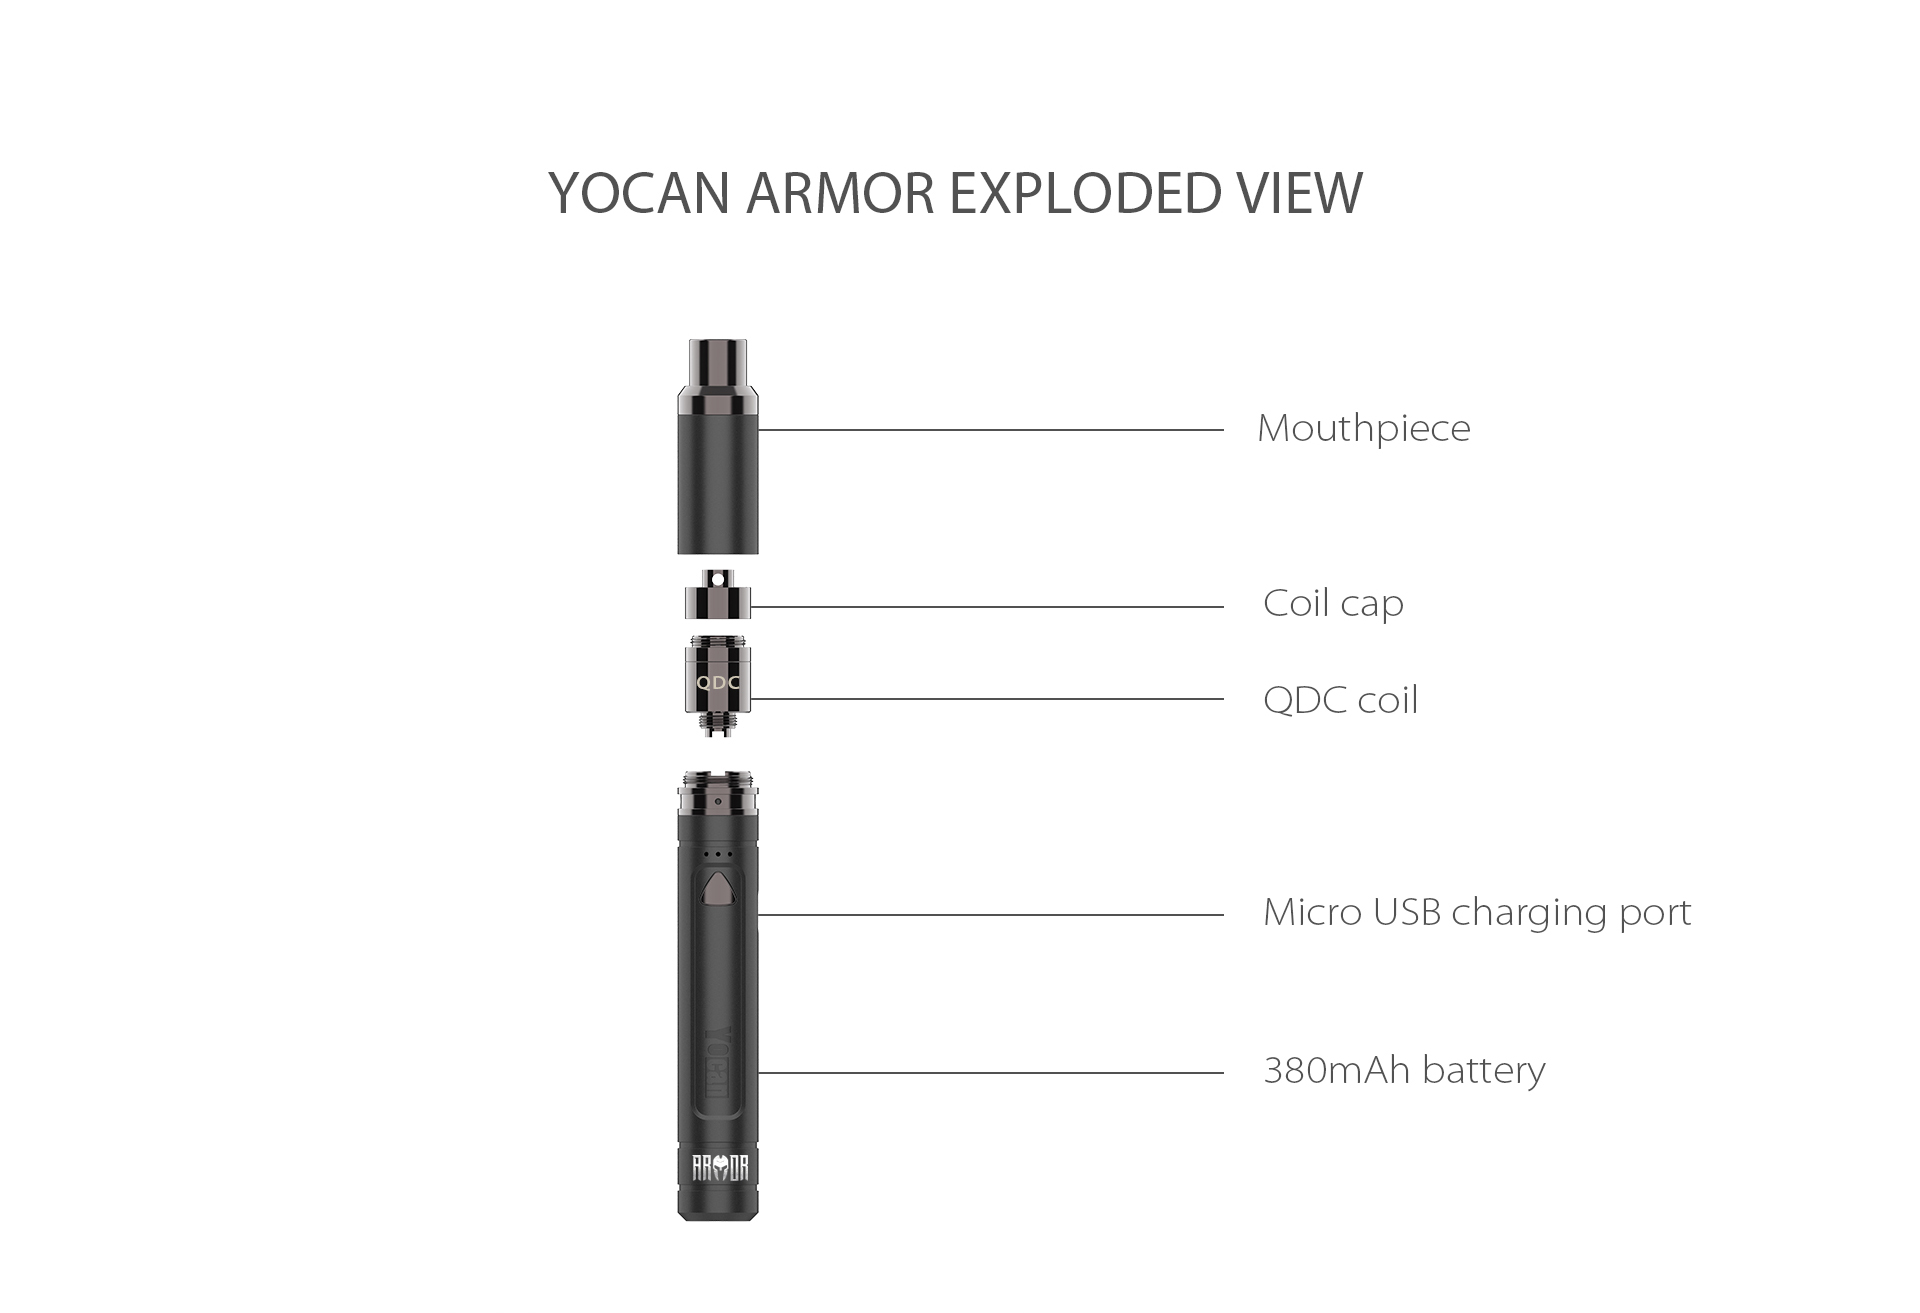 Yocan Armor Vaporizer pen exploded view.